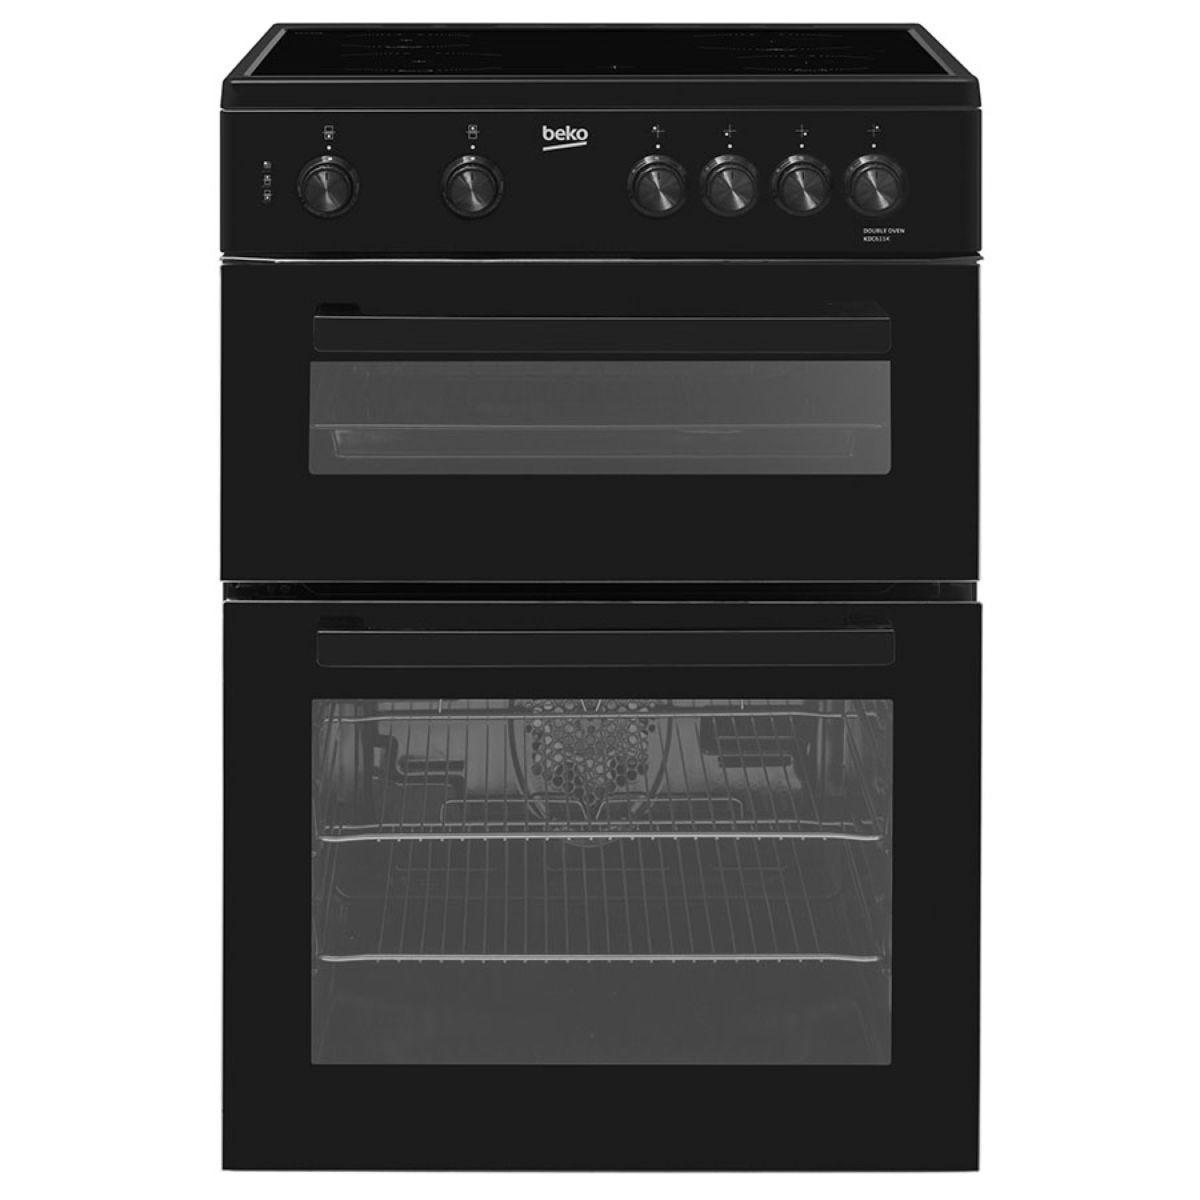 Beko Freestanding KDC611K Double Oven 105L Ceramic Cooker - Black